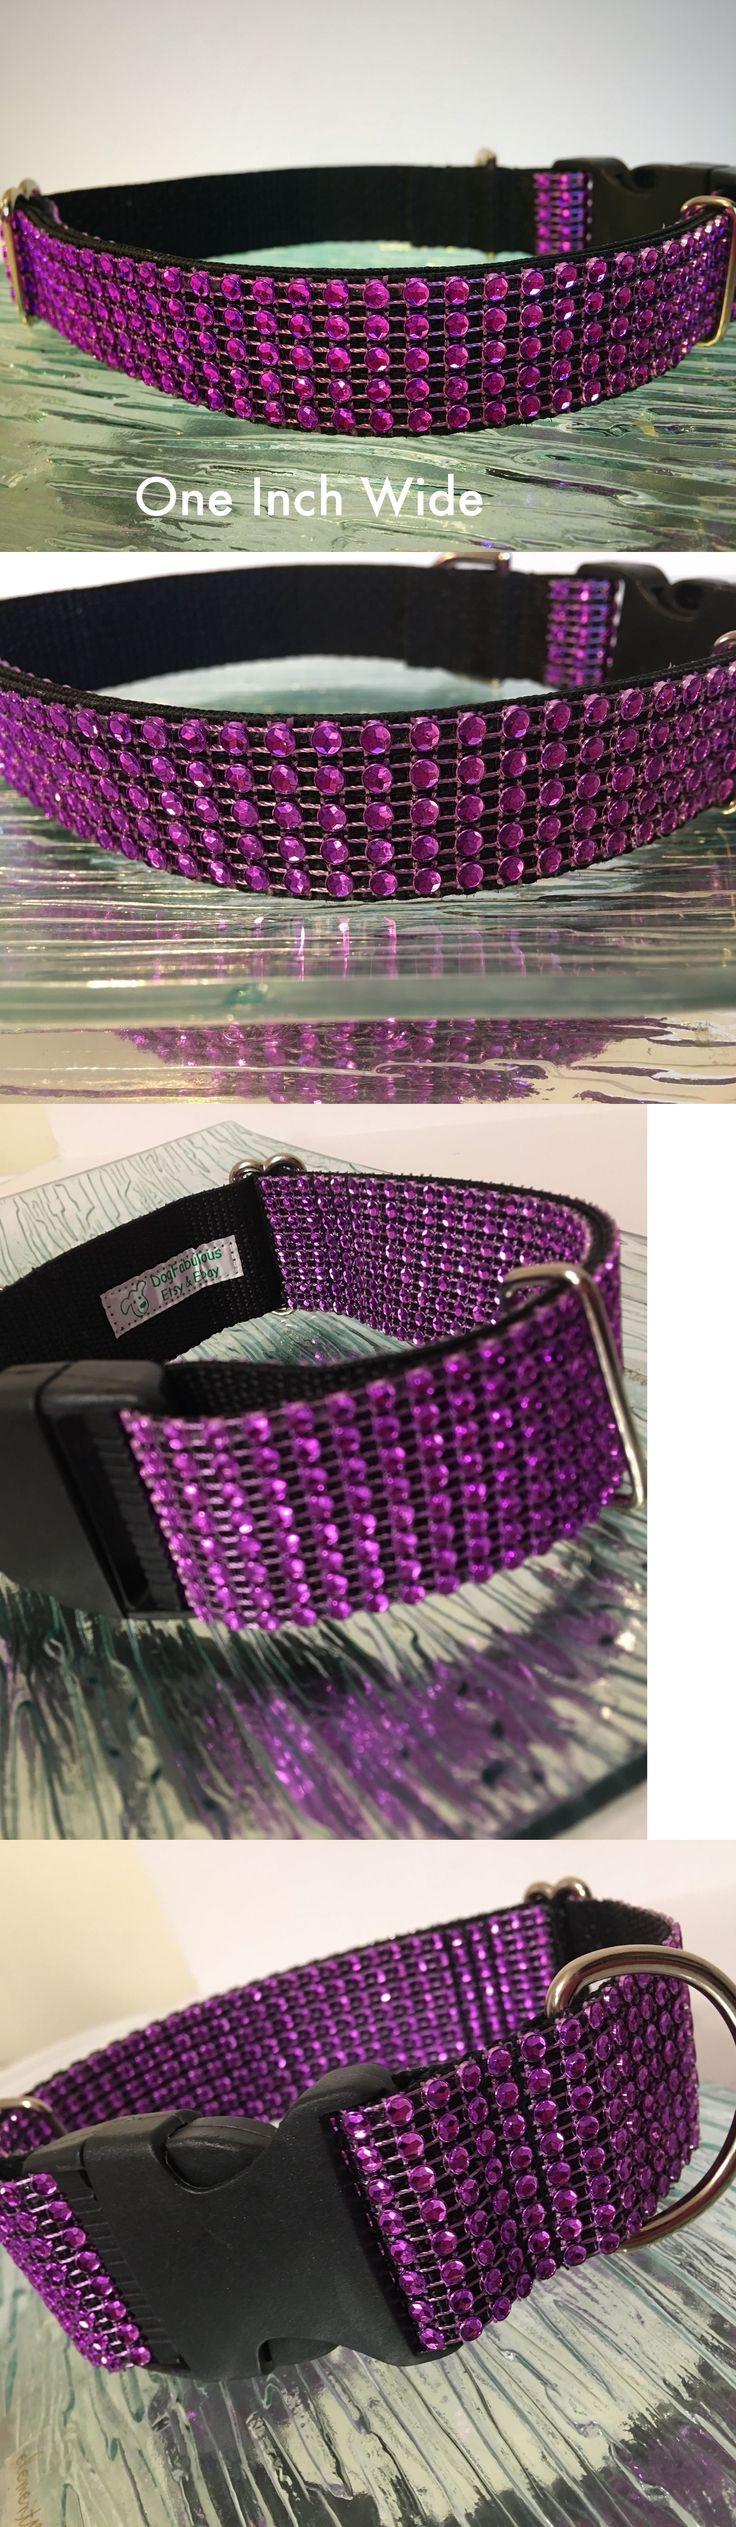 Collars 63057: Rhinestone Purple Bling Dog Collar Sparkly Crystal Fancy Elegant Glam Usa -> BUY IT NOW ONLY: $33.99 on eBay!